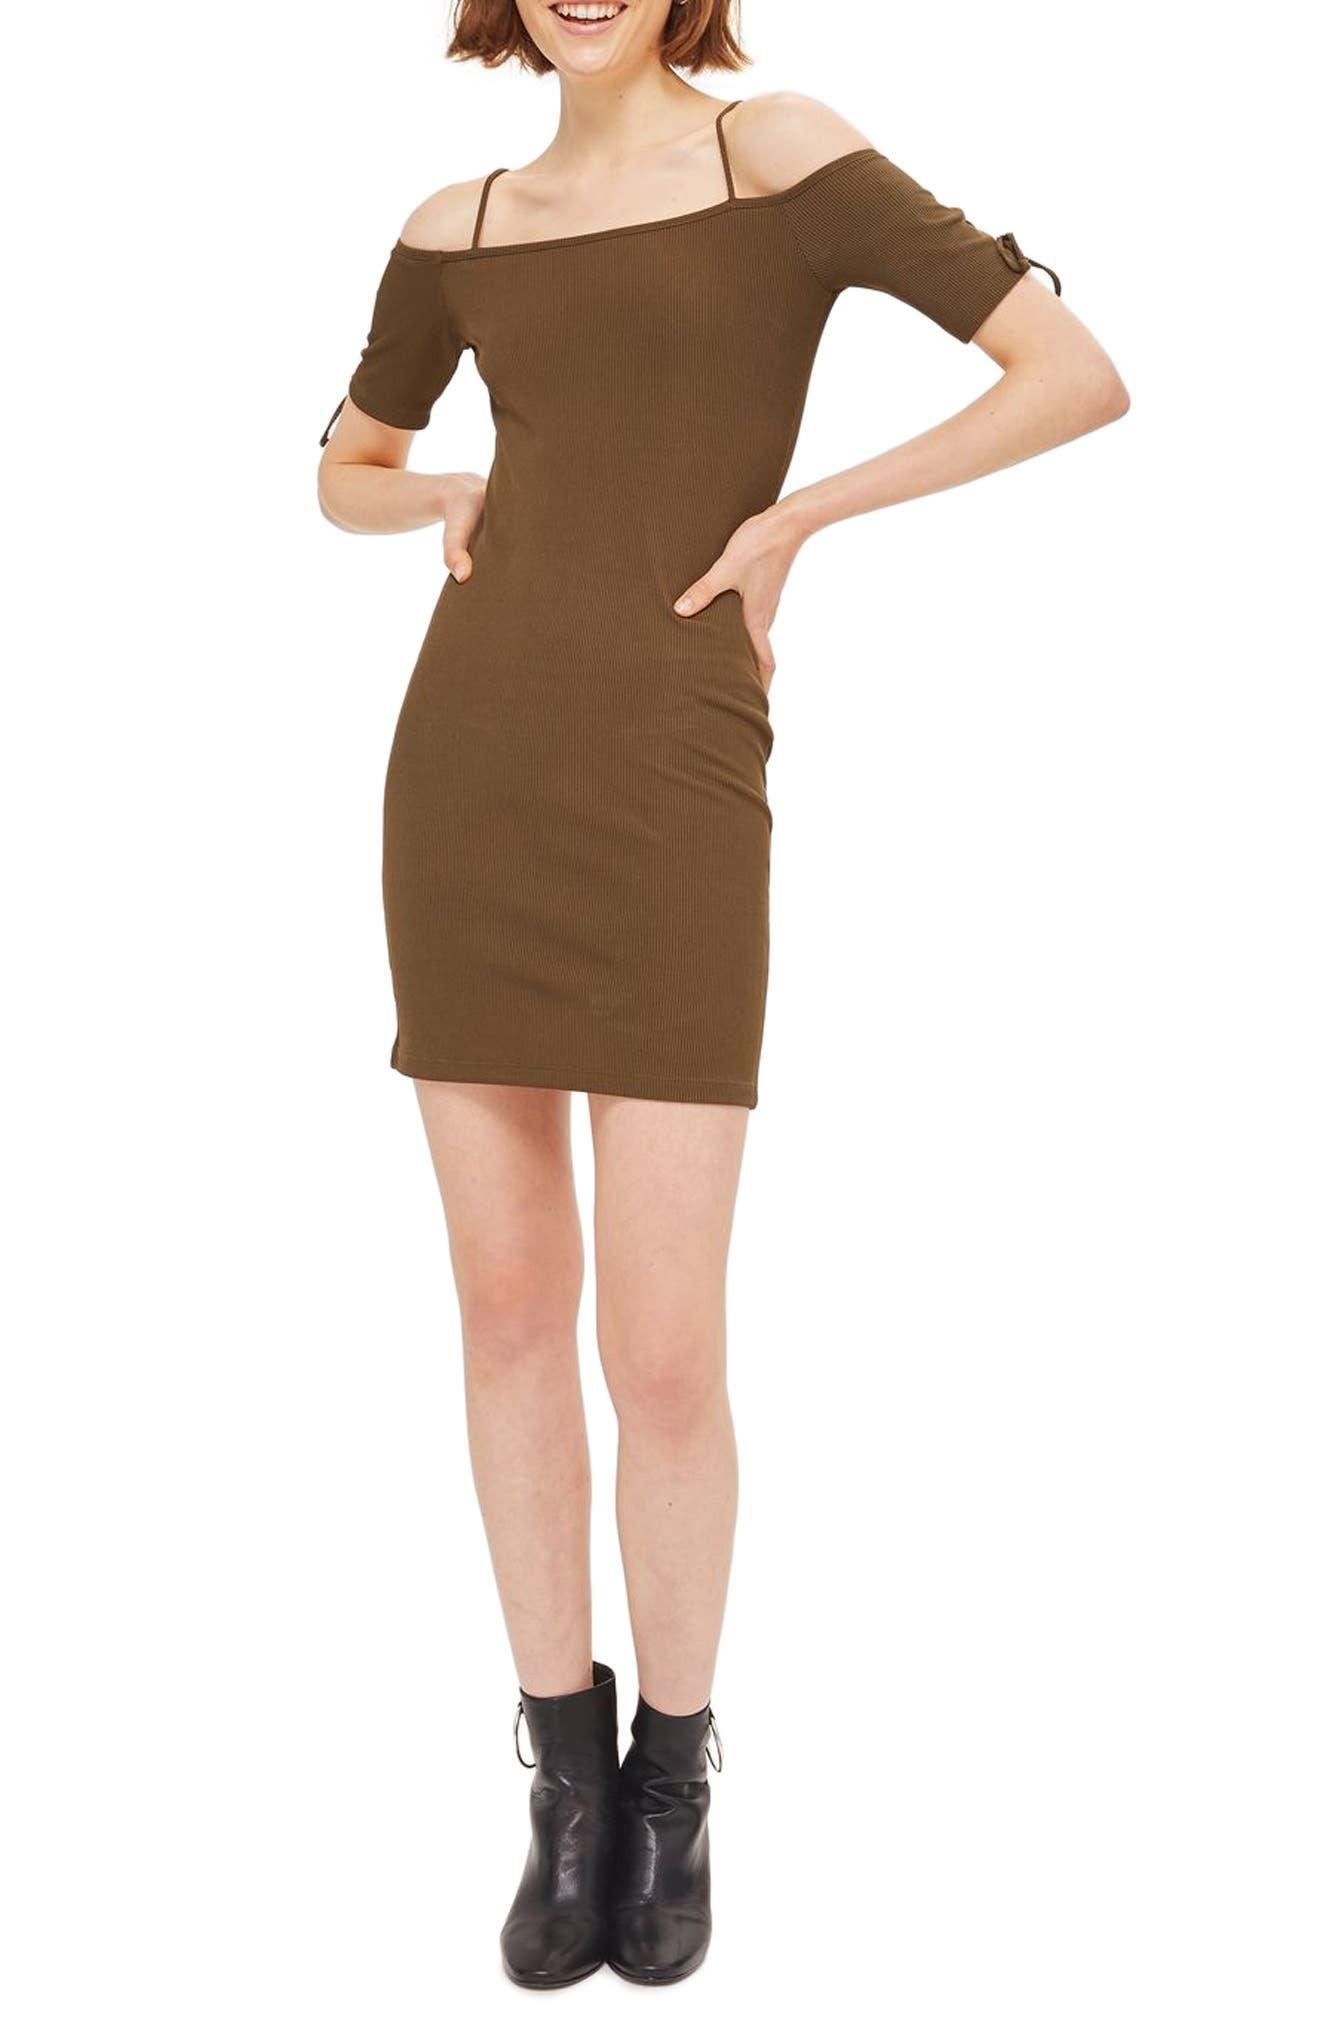 Topshop Lace-Up Sleeve Off the Shoulder Dress